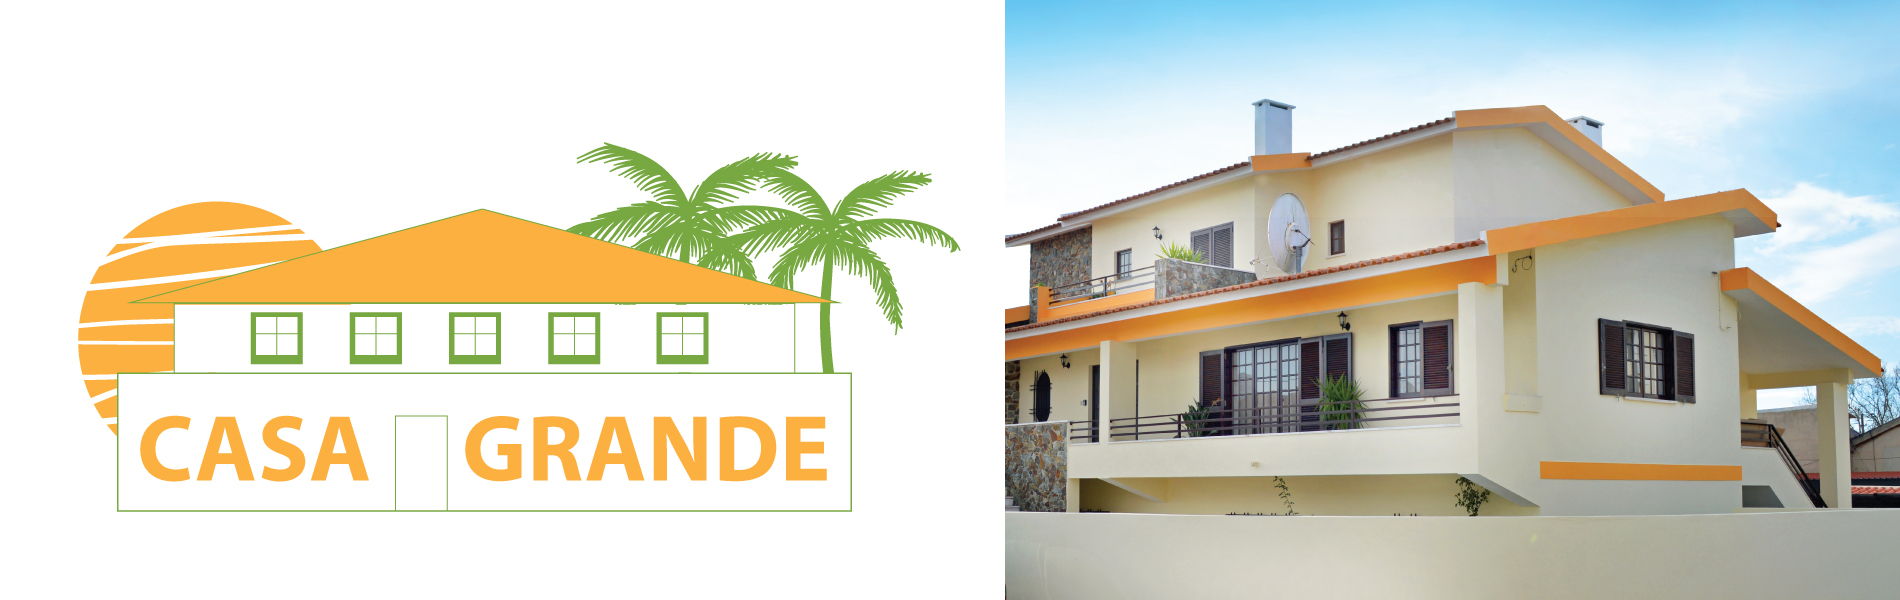 Welcome to Casa Grande